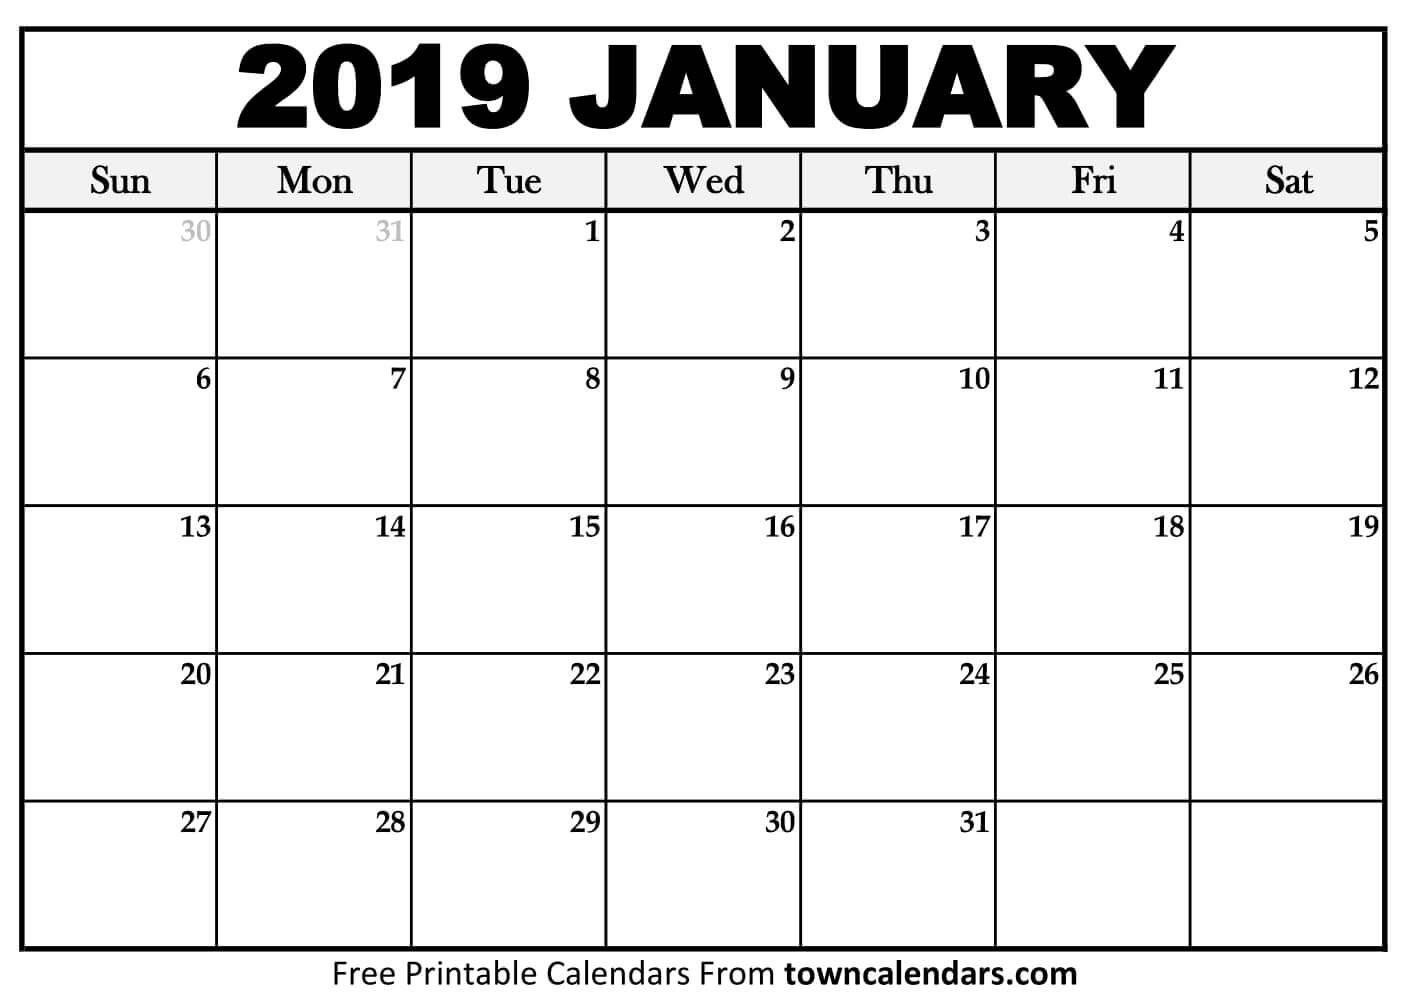 Printable January 2019 Calendar – Towncalendars Calendar Of 2019 January